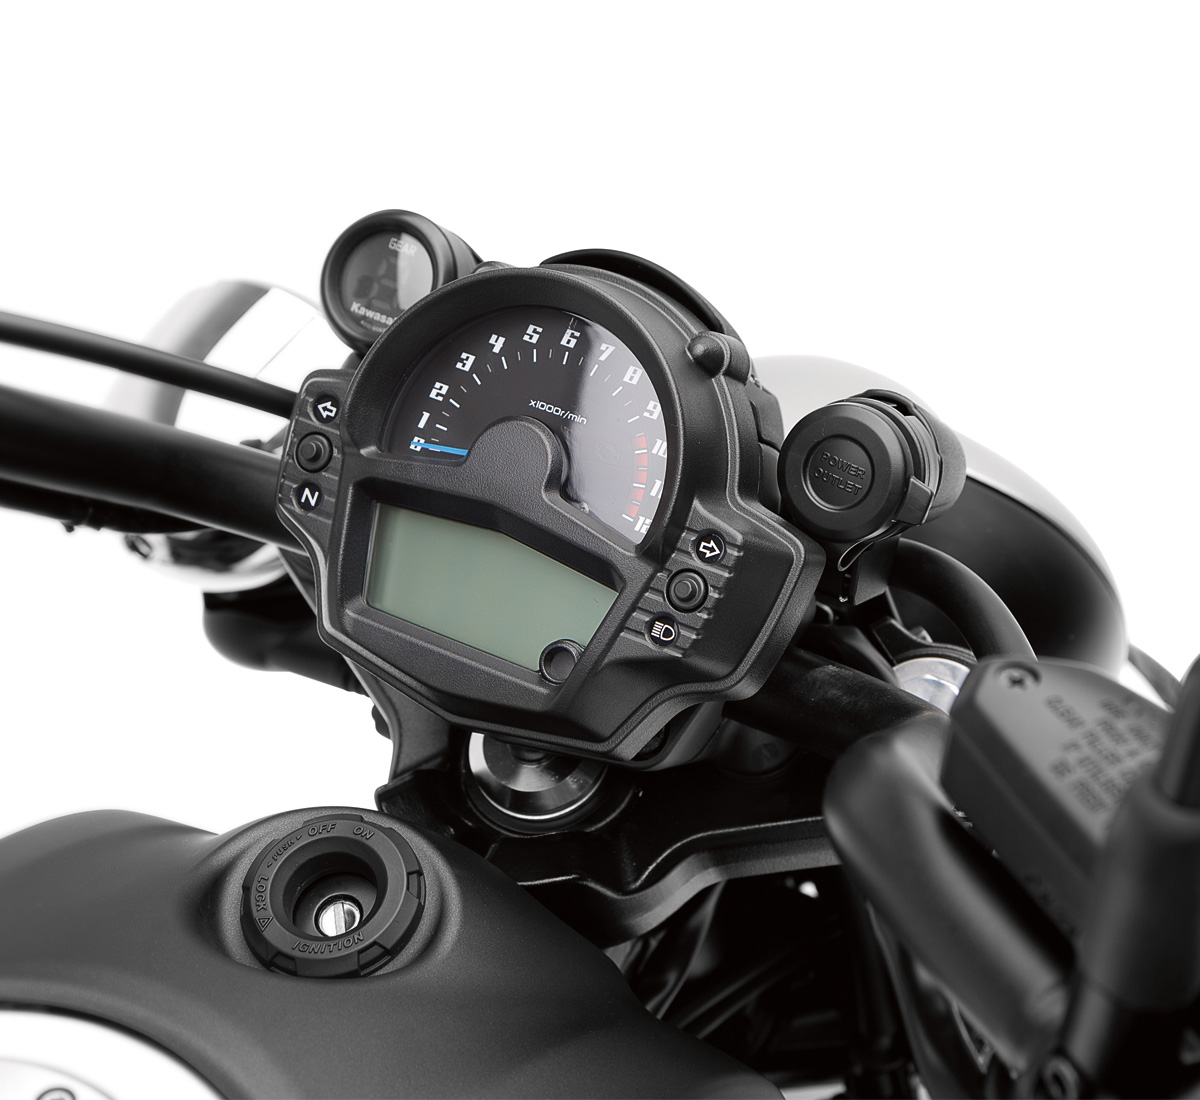 Kawasaki Vulcan Gear Indicator S